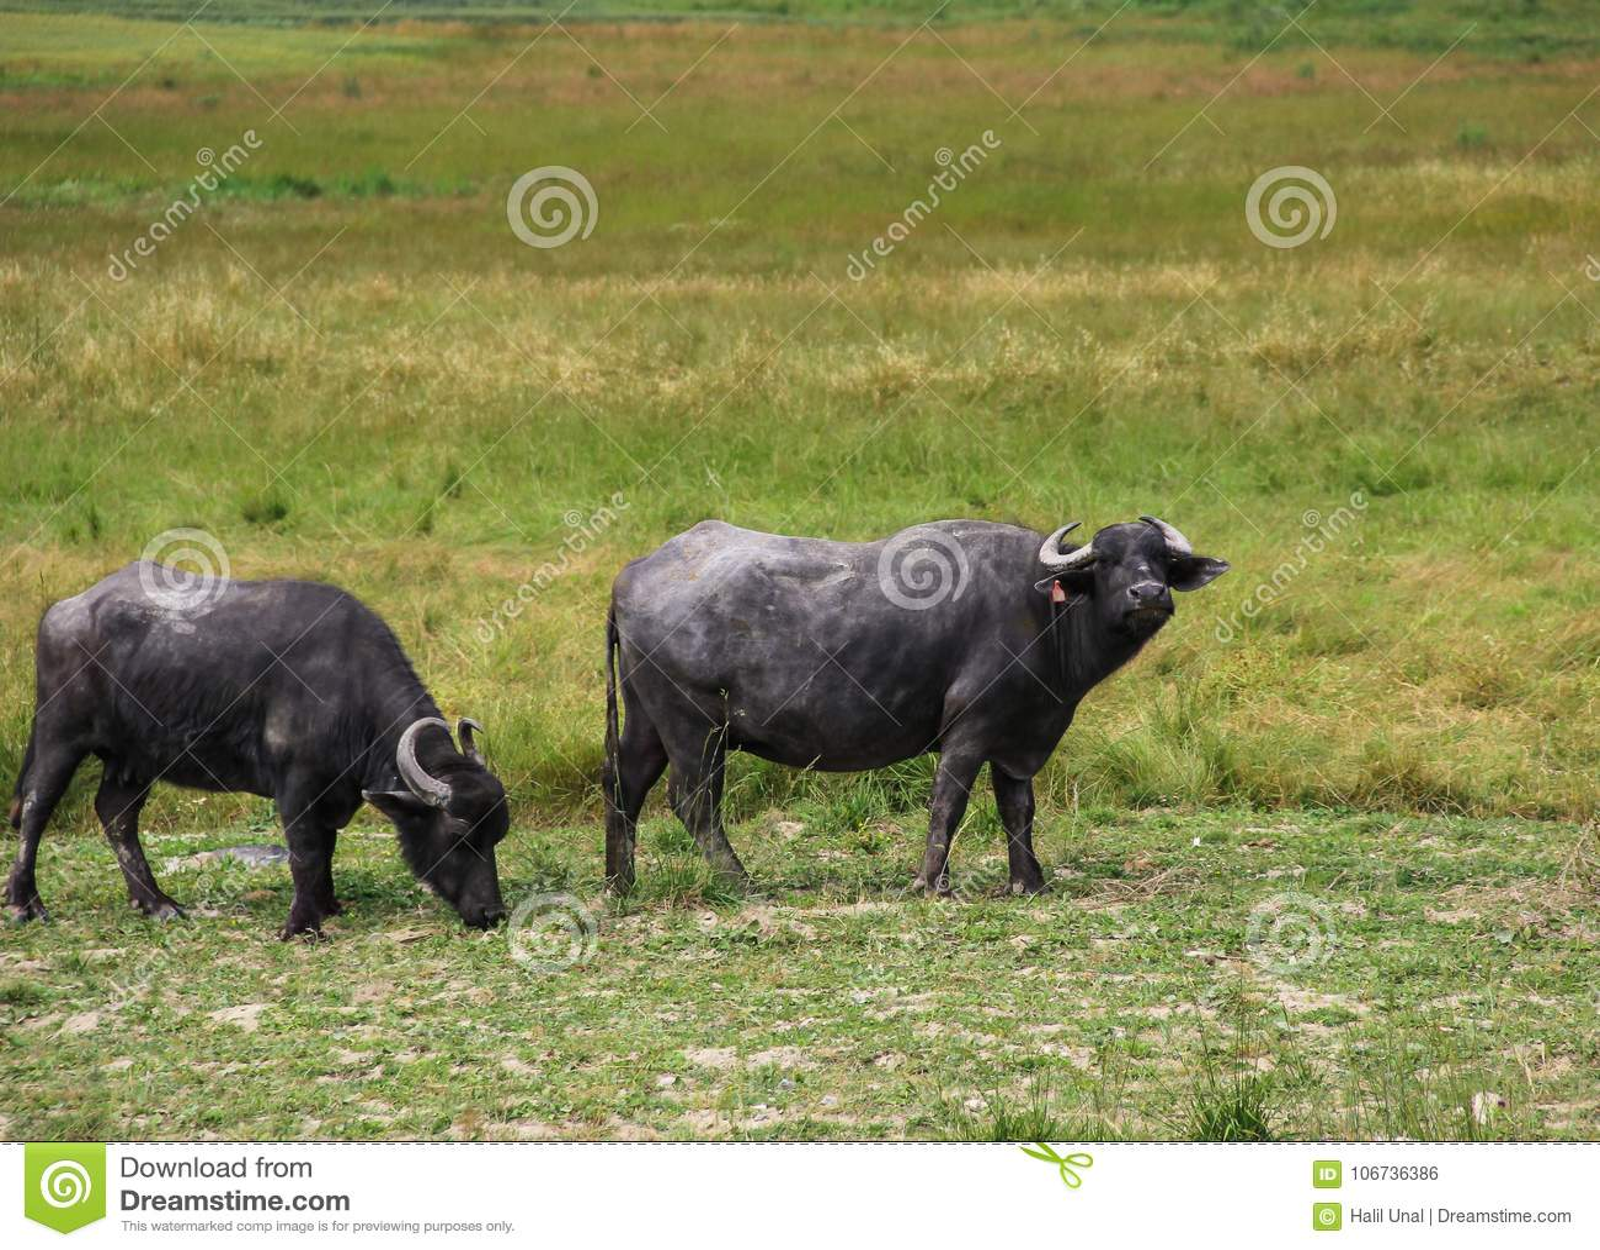 Wo-Büffel, die in den Weiden weiden lassen